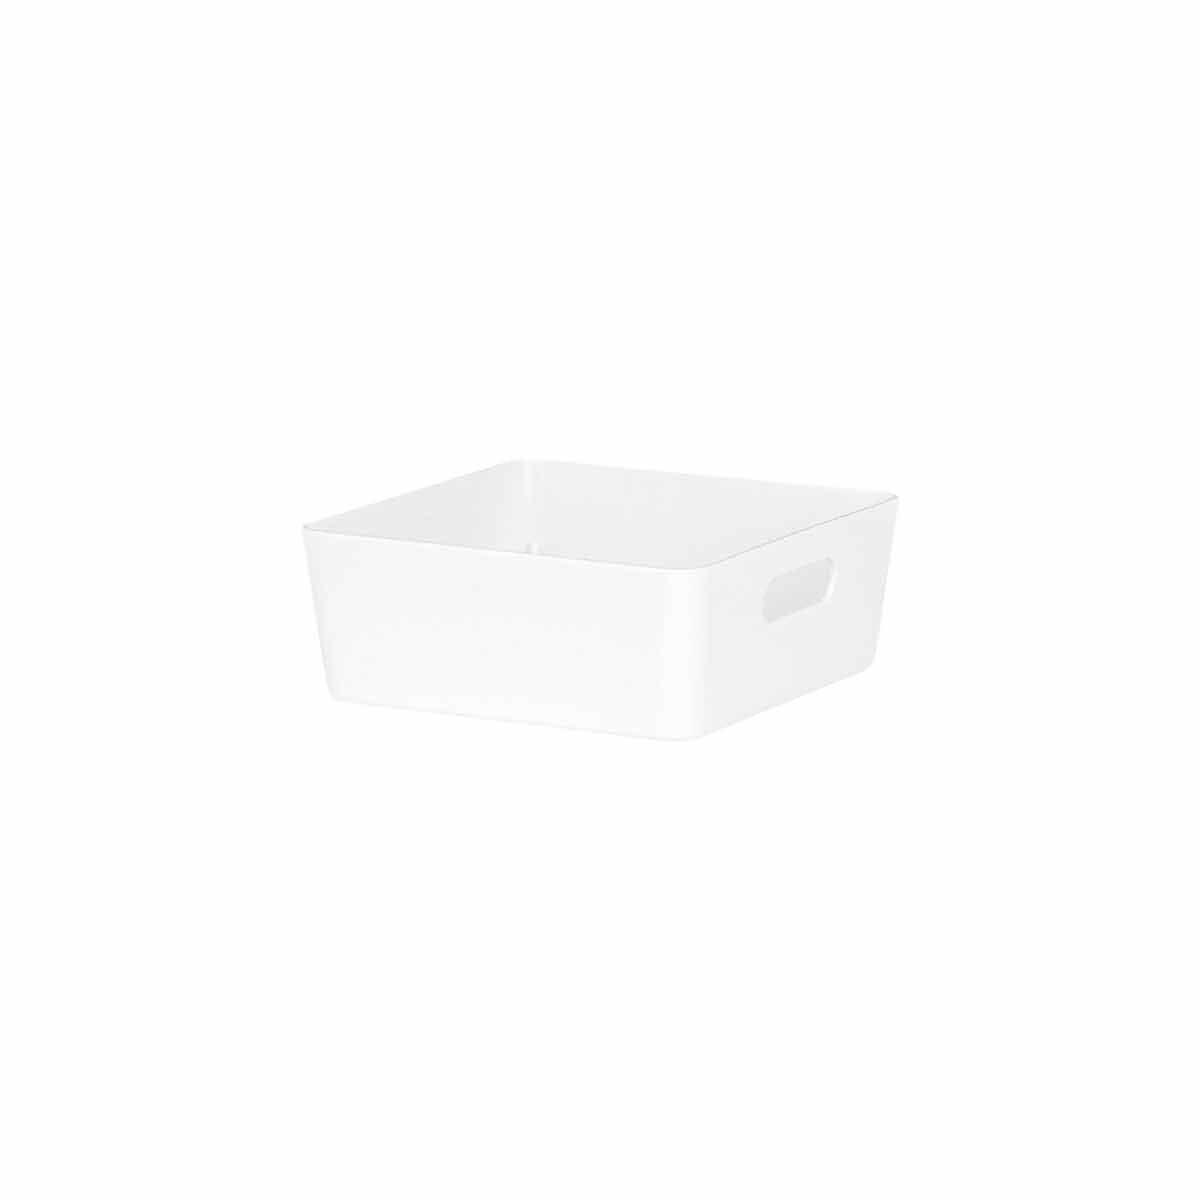 Wham Studio Rectangular Basket 13.01 White